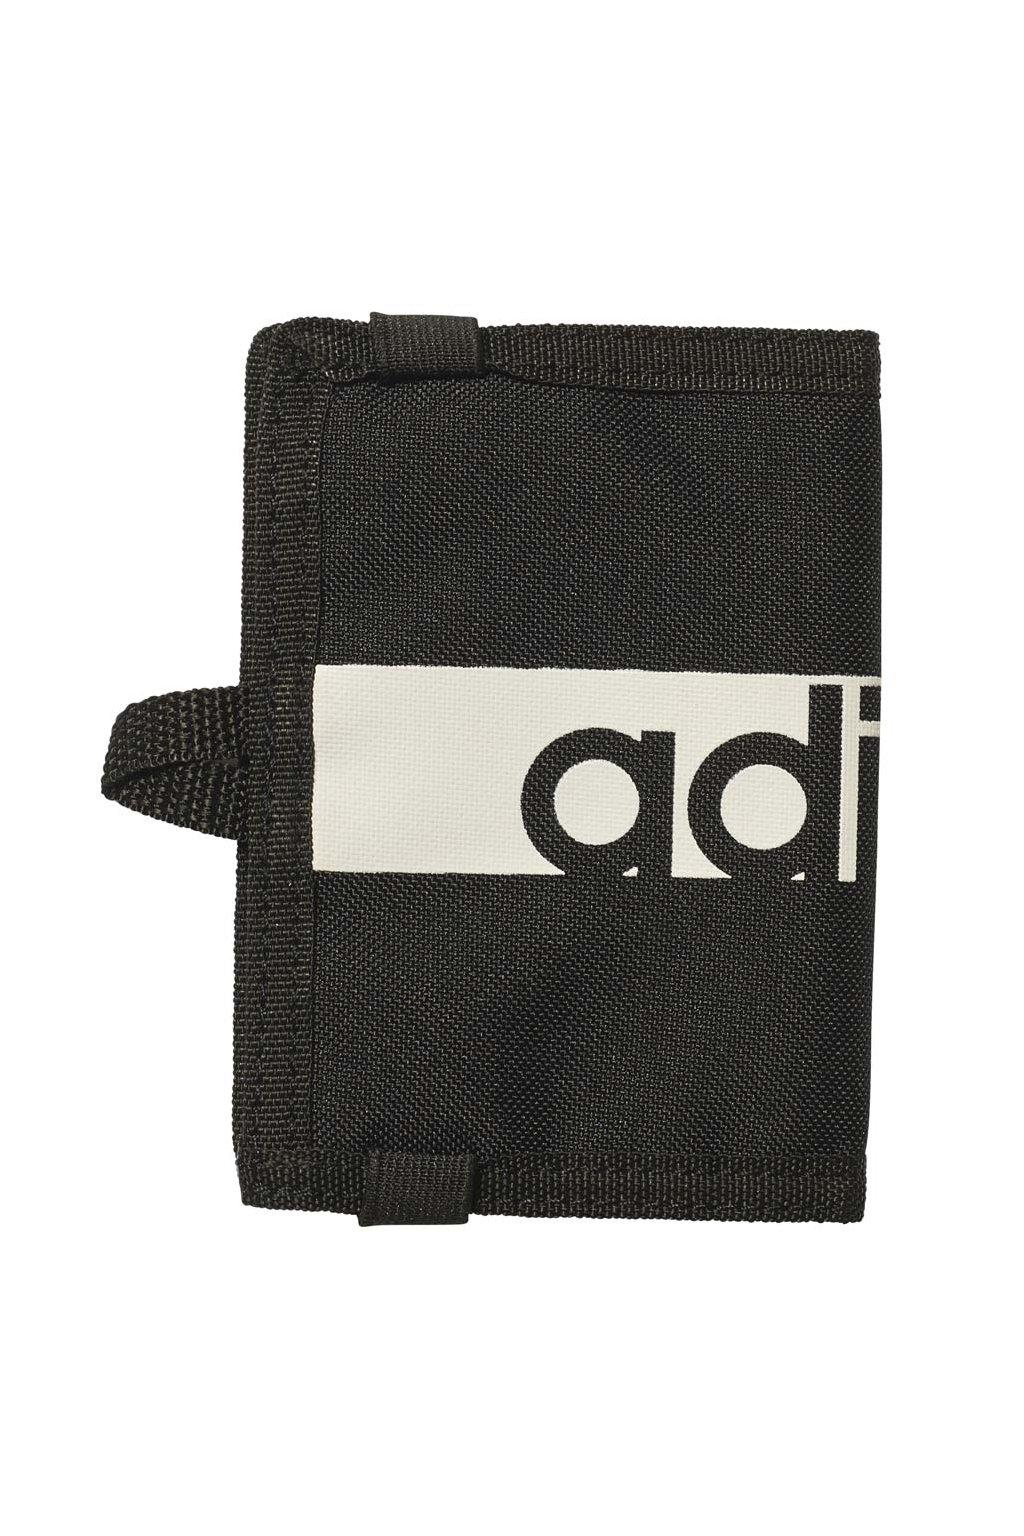 Peňaženka Adidas Linear Performance čierna S99979